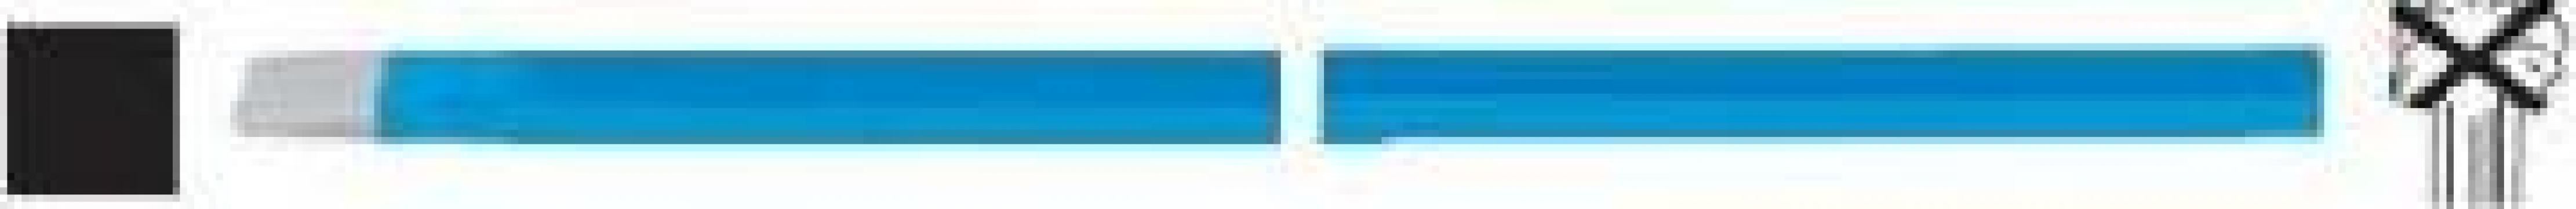 Dalta electricieni 1405-012 de la Nascom Invest